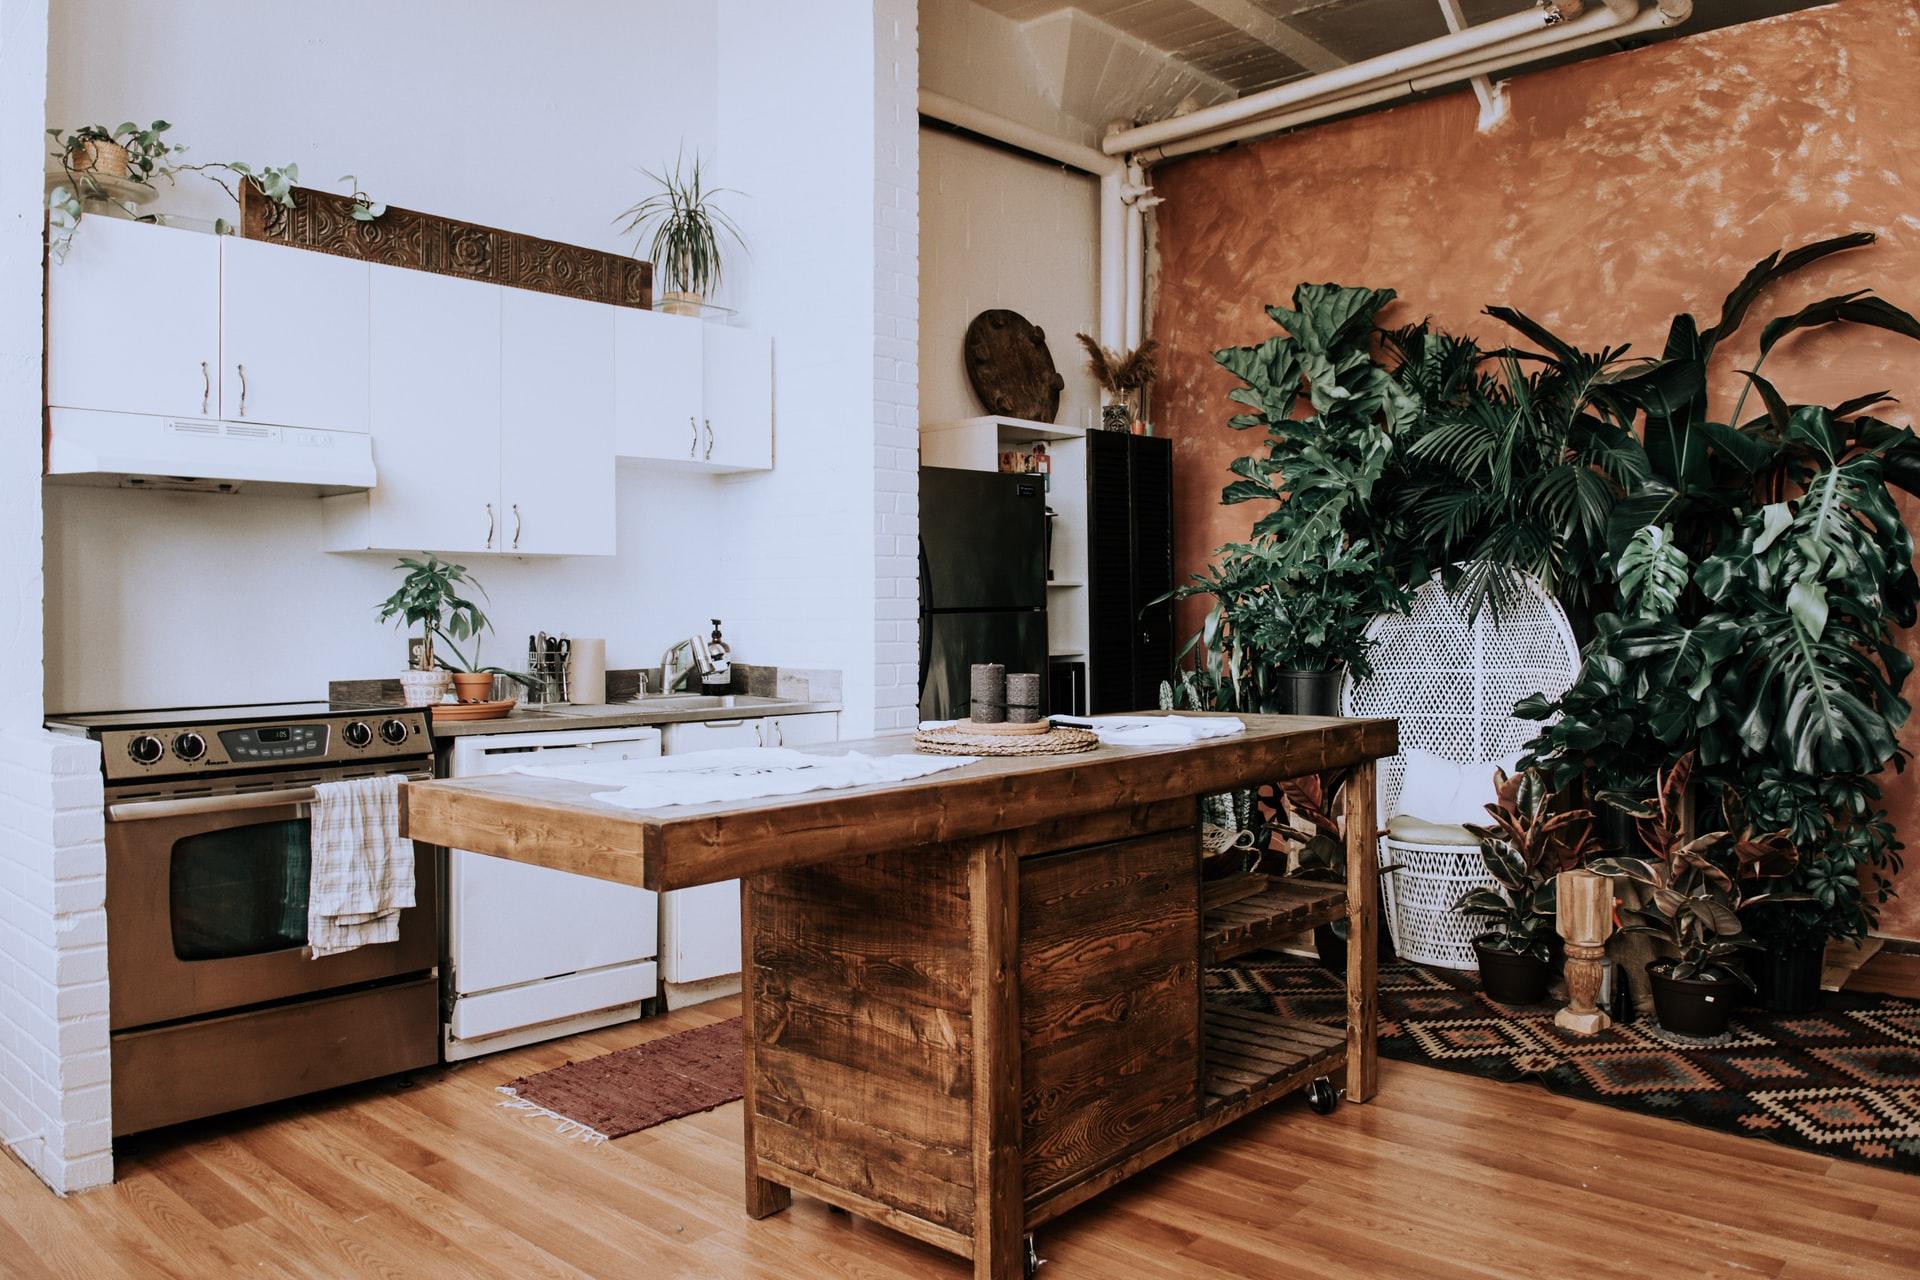 Кухня, дизайн, дизайн кухни, удобная кухня, красивая кухня, современная кухня, бытовая техника на кухне, дизайн современной кухни